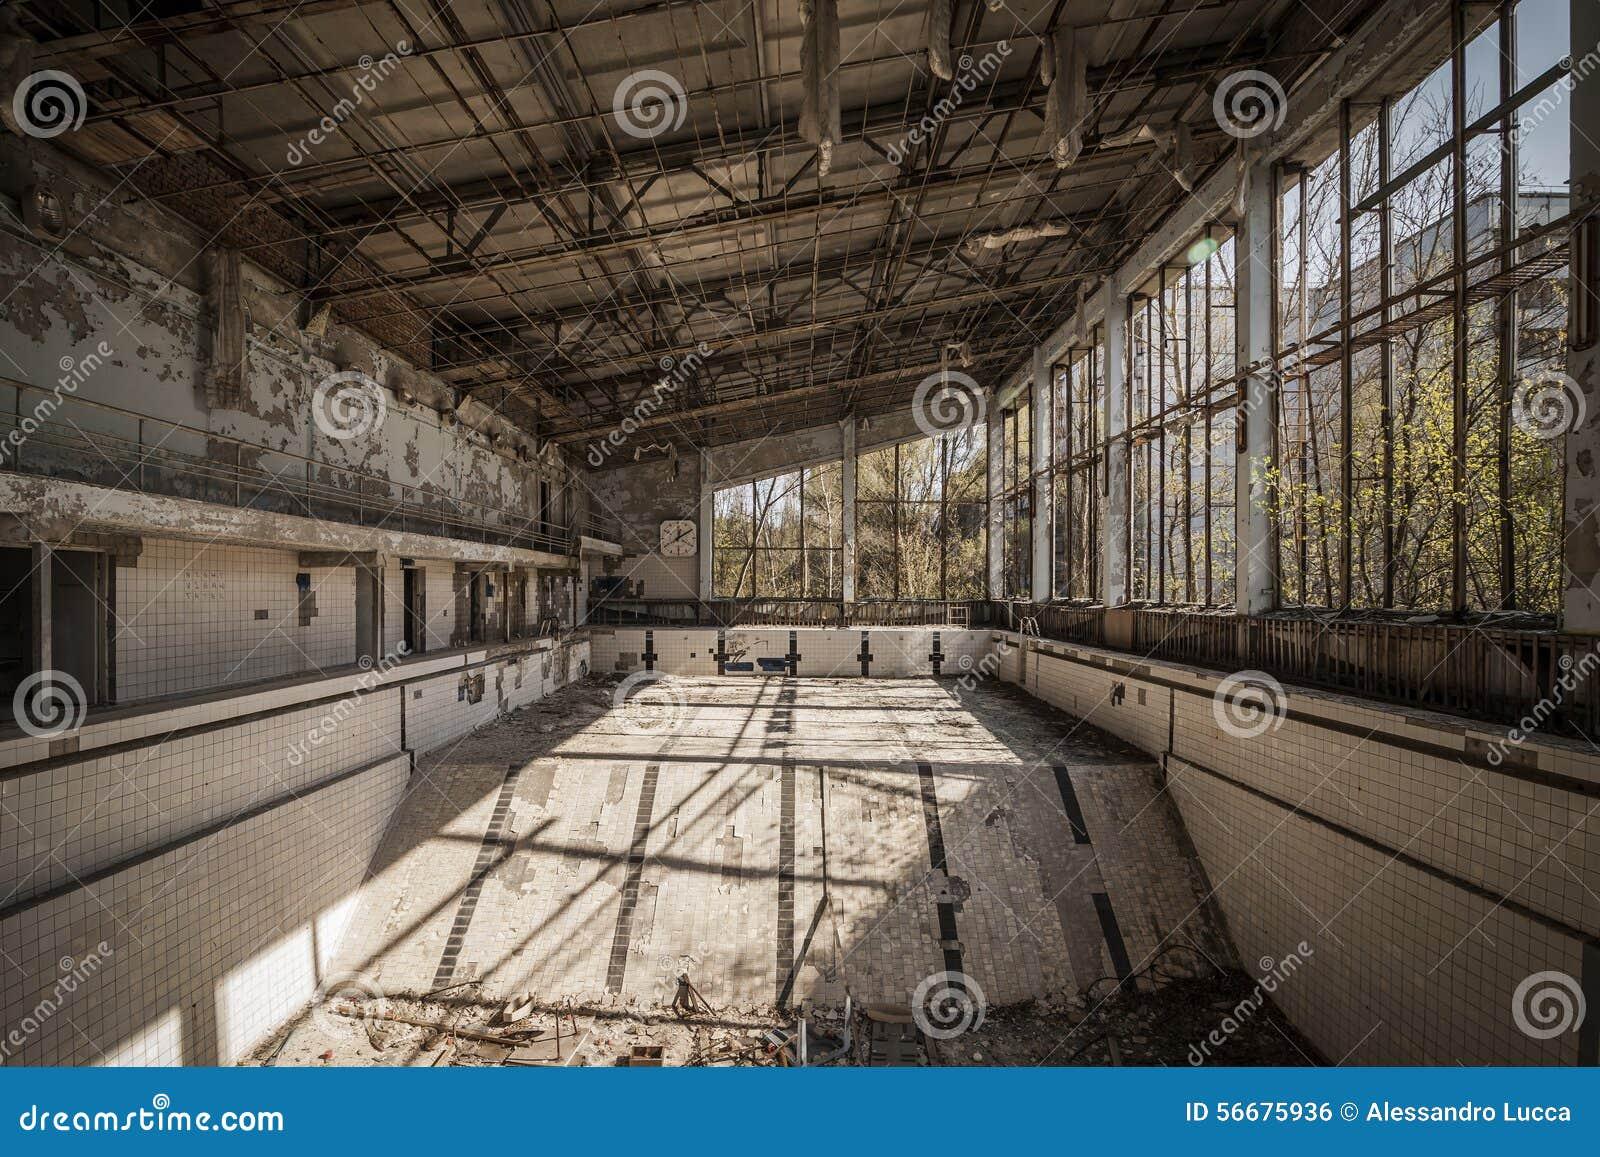 Chernobyl Abandoned Swimming Pool In Pripyat Stock Photo Image Of Broken Abandoned 56675936